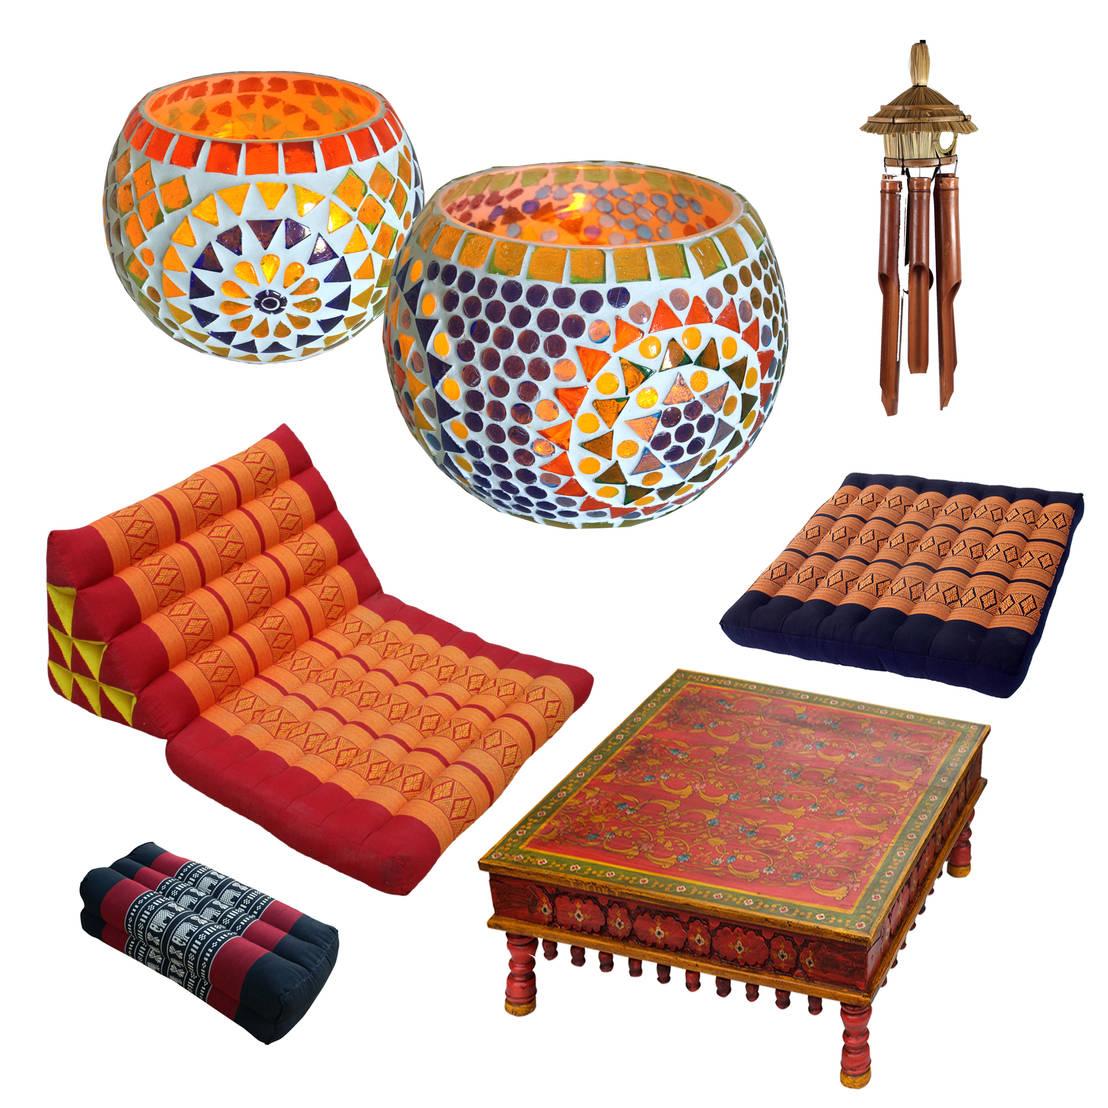 originelle ideen f r balkon und terrasse de guru shop homify. Black Bedroom Furniture Sets. Home Design Ideas